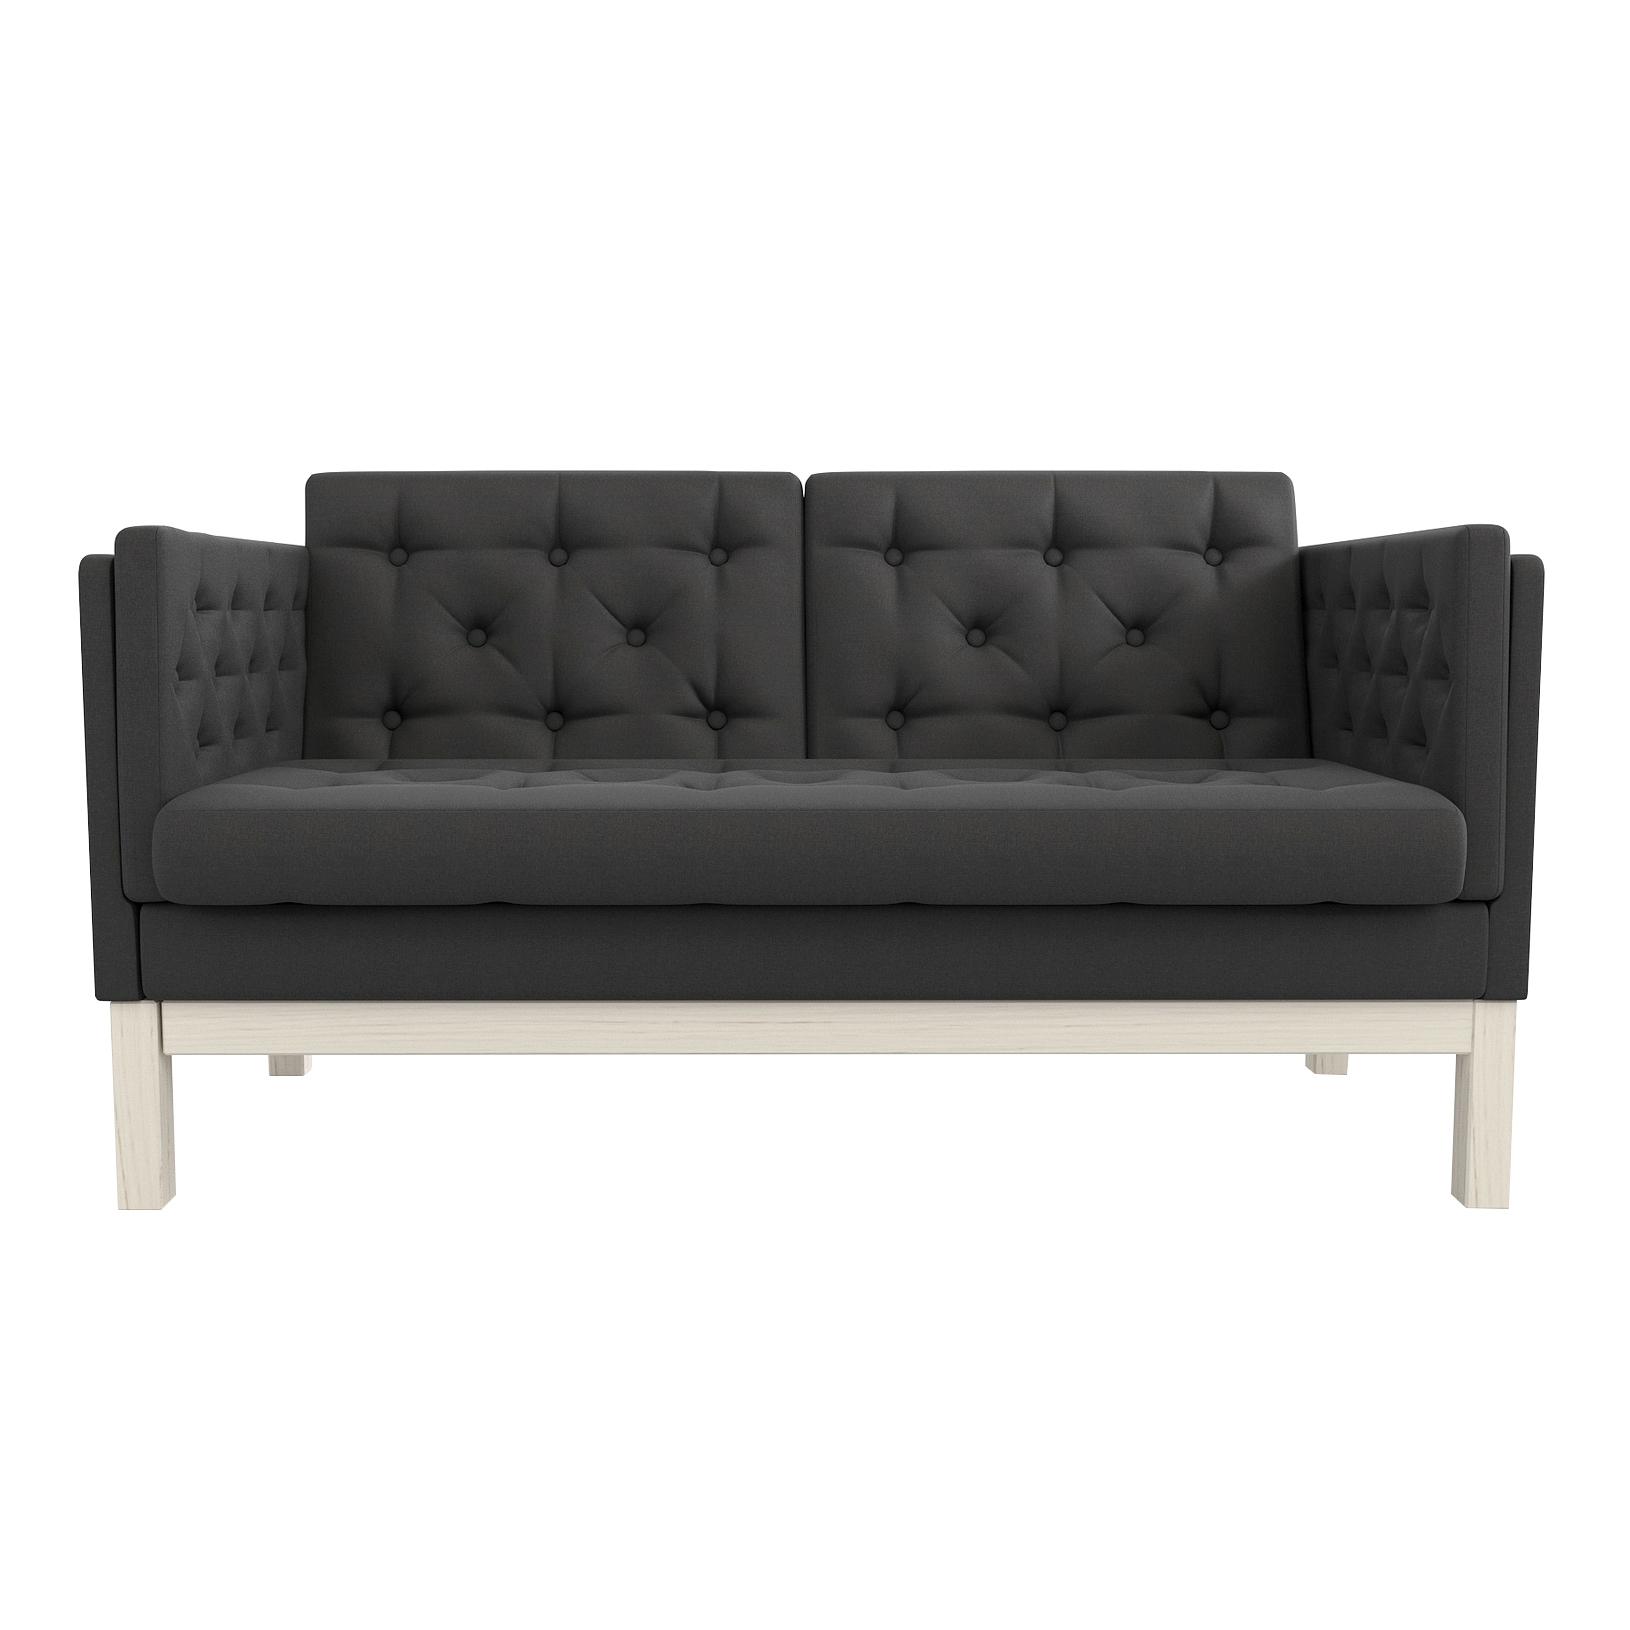 Фото - Диван AS Алана м 154x82x83 беленый дуб/черный диван as алана м 154x82x83 сосна коричневый